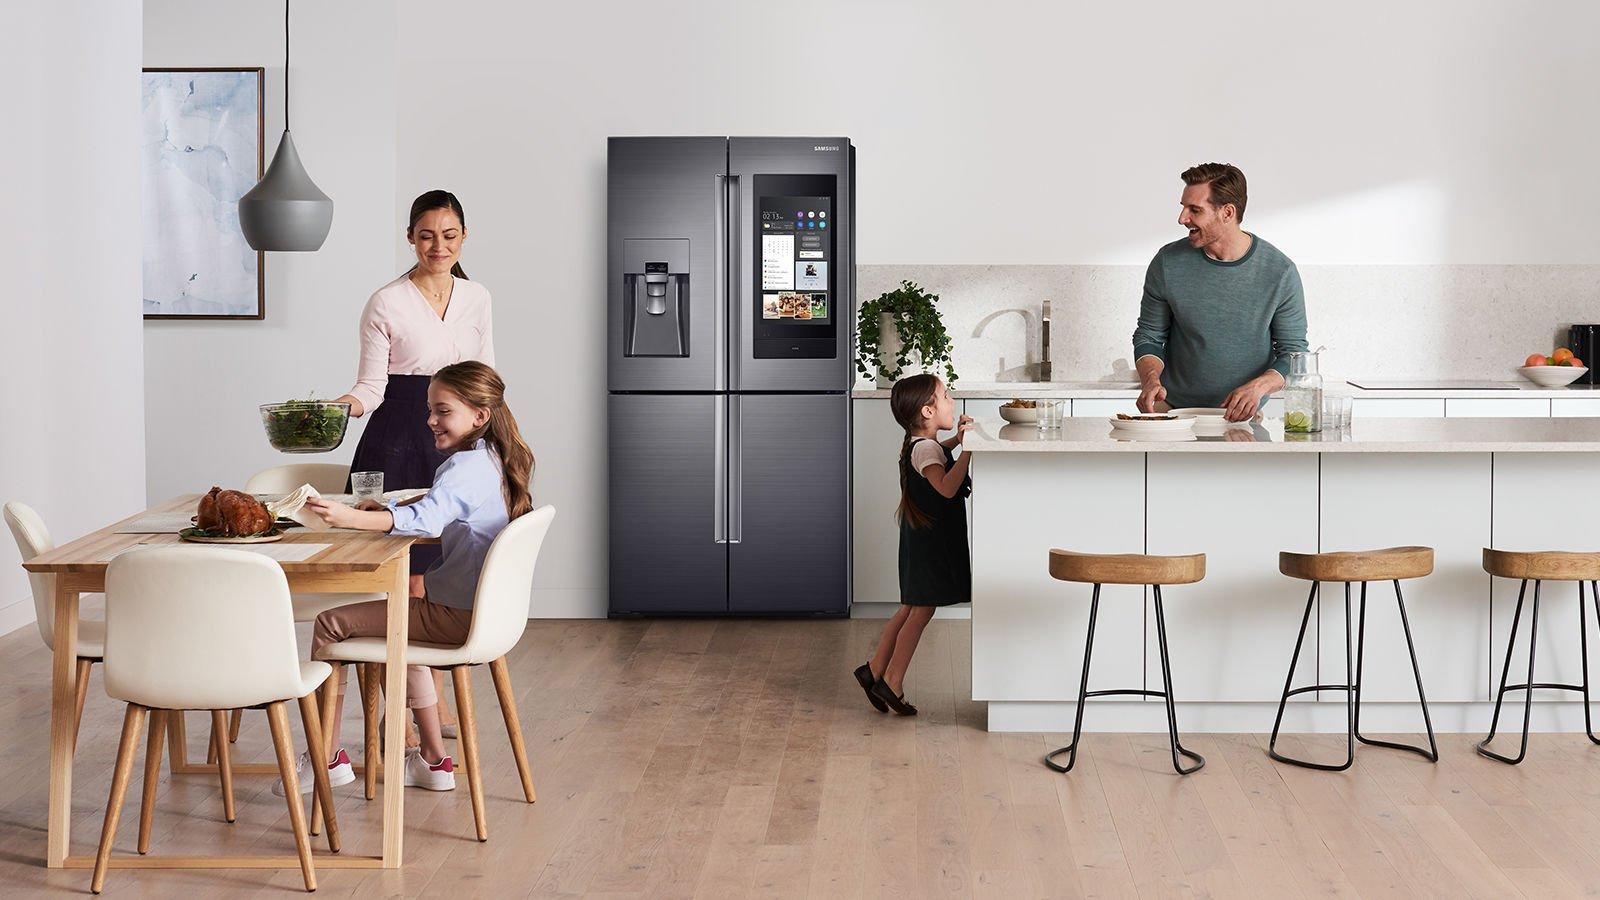 aile ve teknoloji